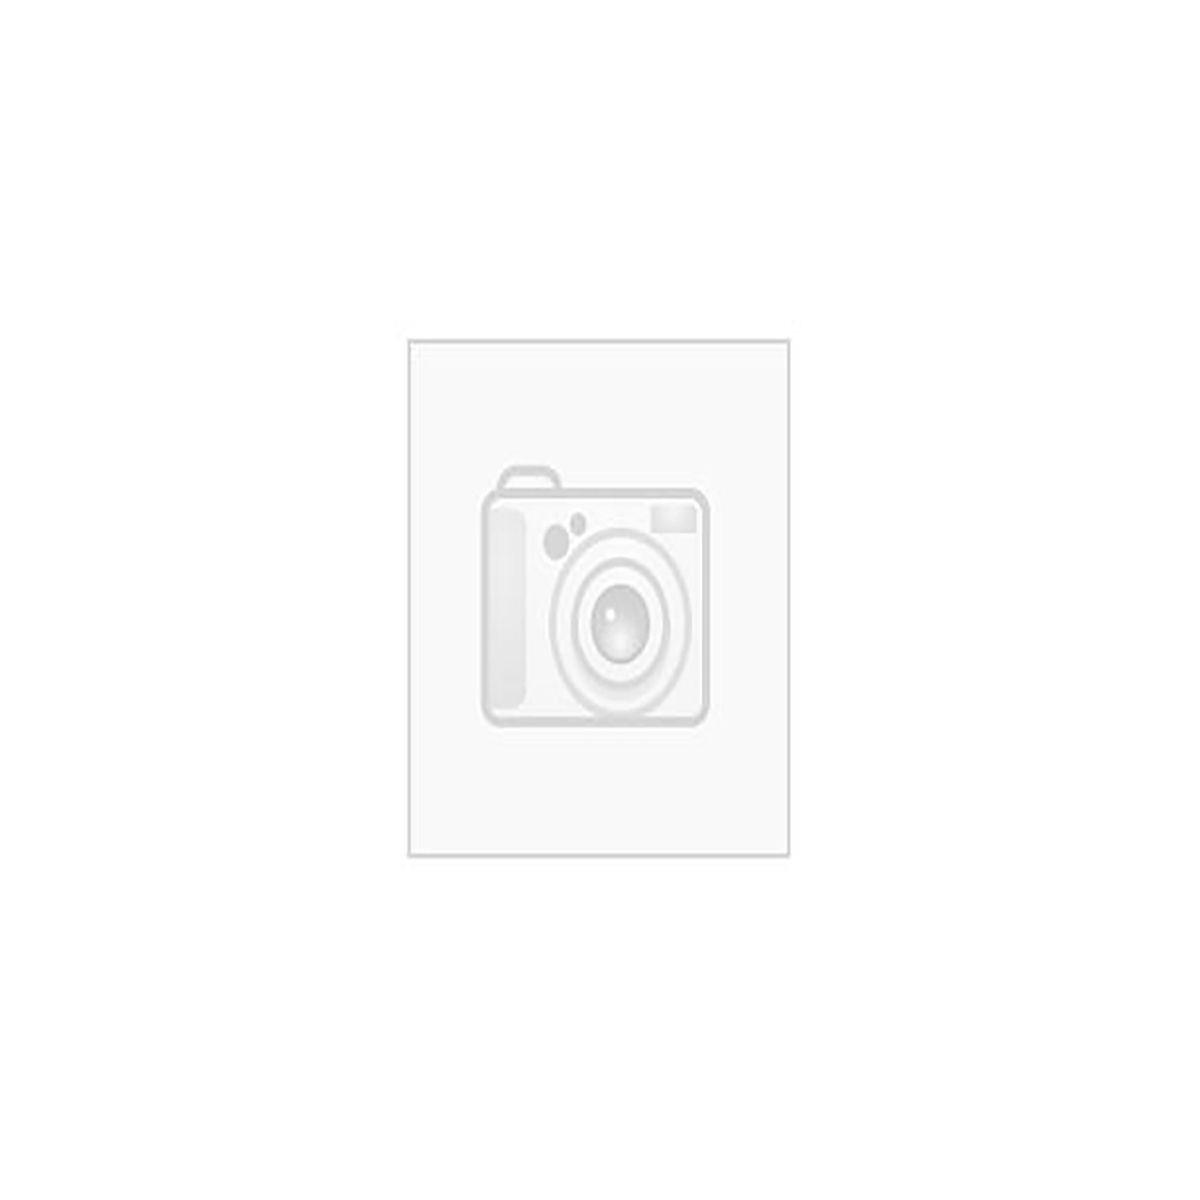 Sanipex Fordelerskap 2 x 5 uttak